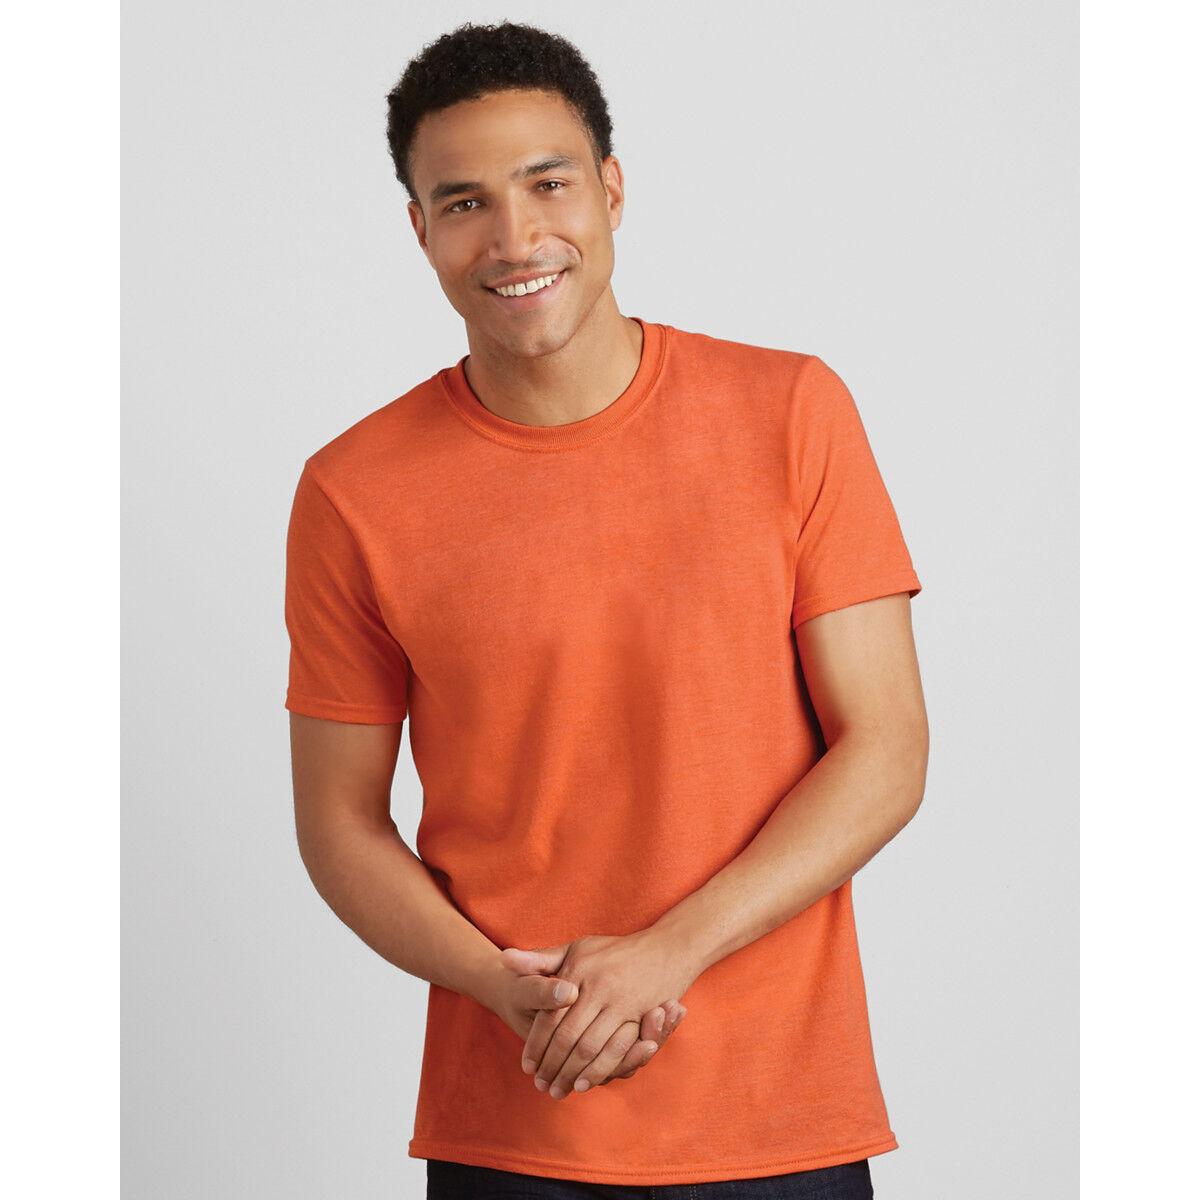 Gildan Men's Soft-Style T-Shirt - Orange